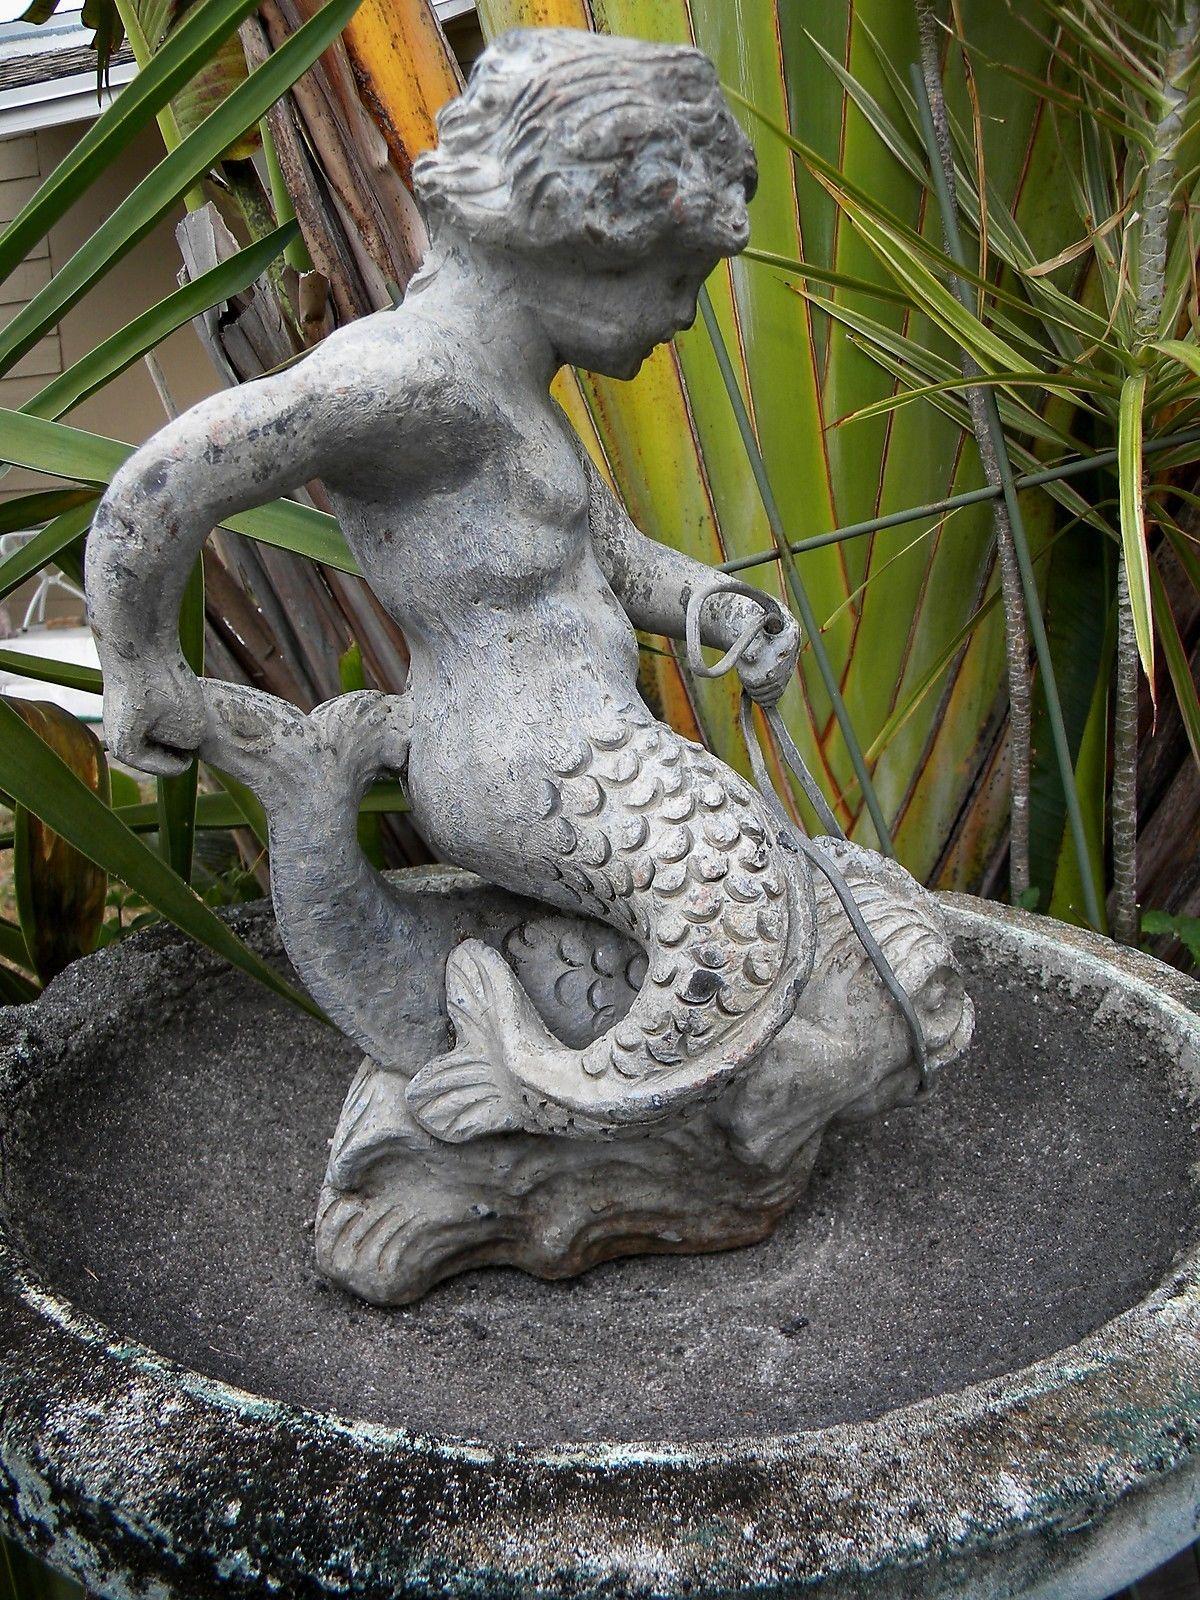 Antique Lead Fountain Architectural Garden Mermaid Boy Child Putti On  Dolphin